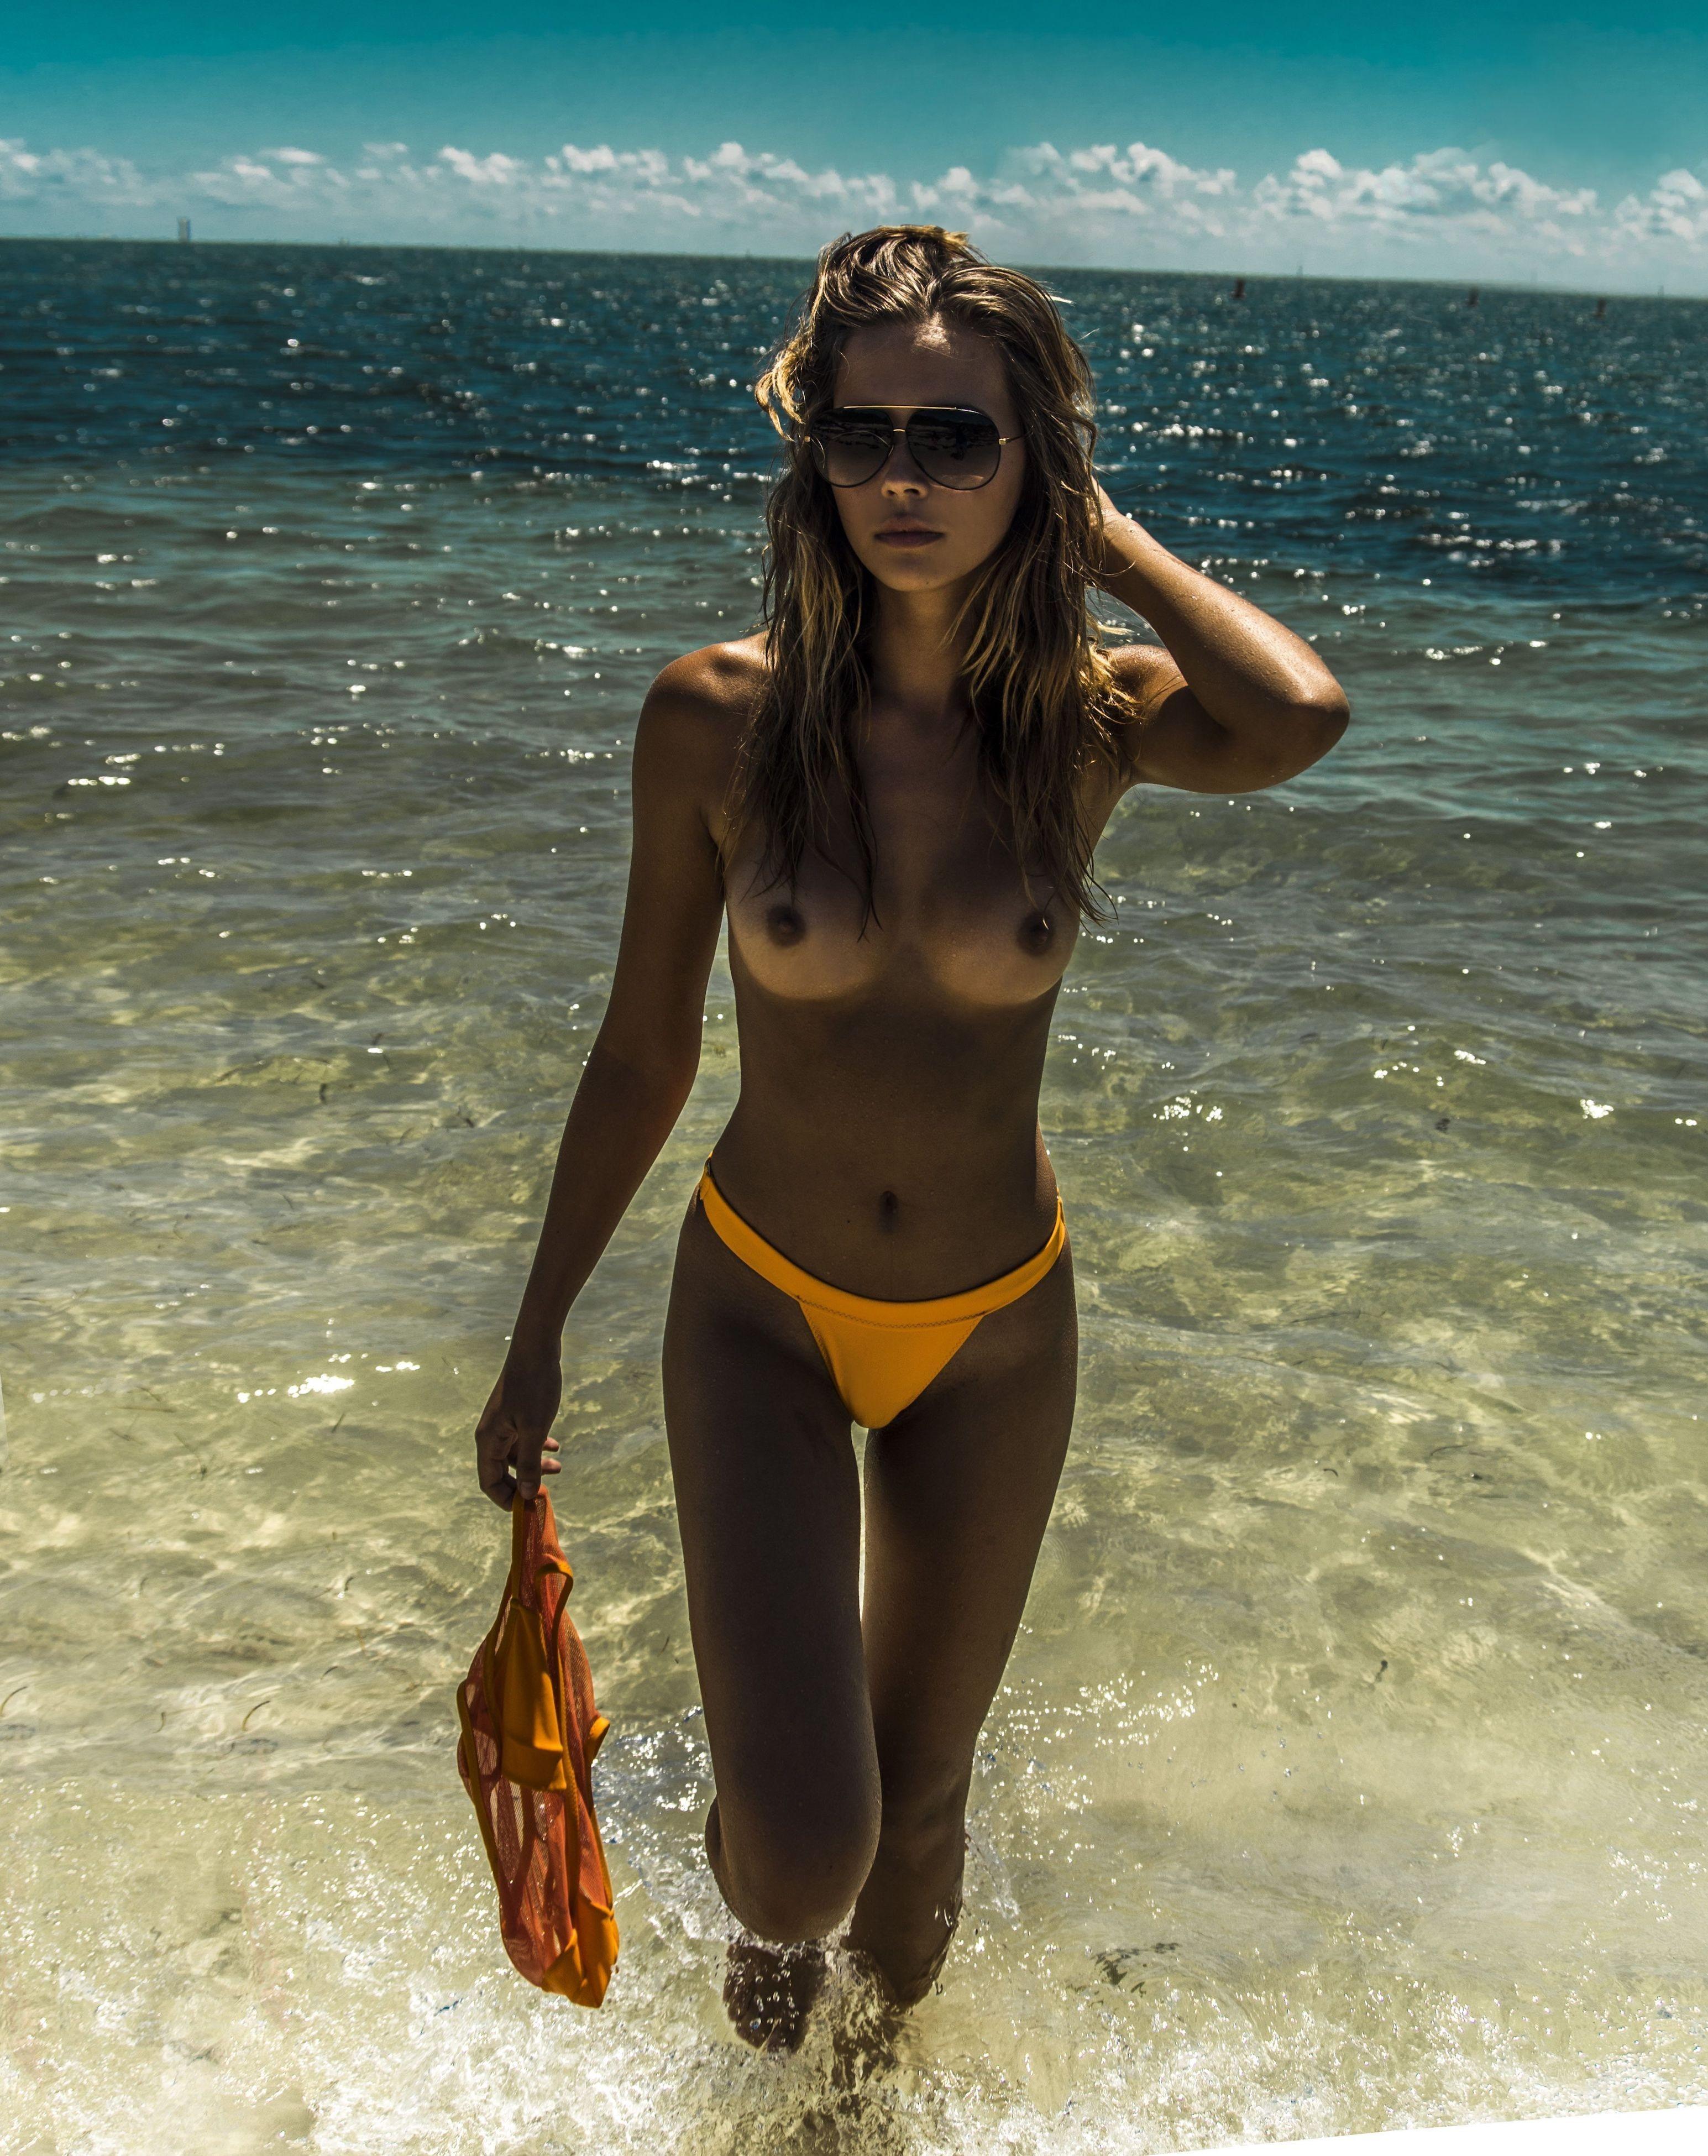 Sandra Kubicka Nude Naked Pics And Videos Imperiodefamosas